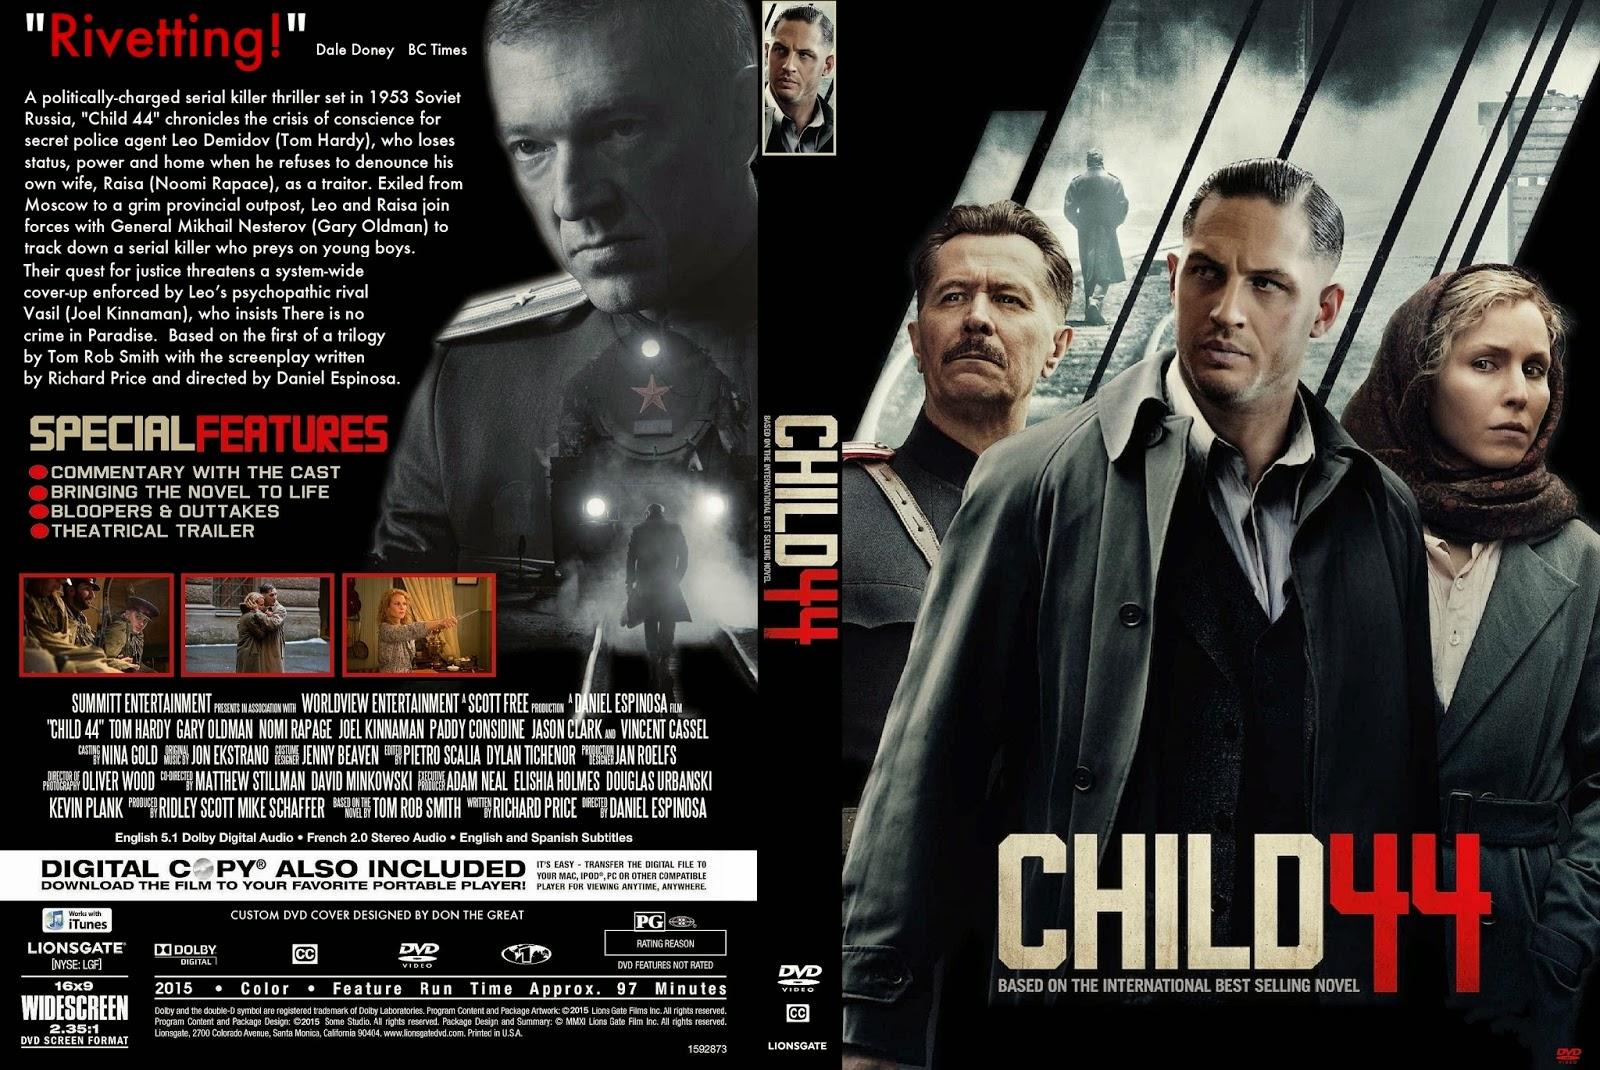 Baixar Crimes Ocultos BDRip XviD Dual Áudio Child 2B44 2B 25282015 2529 2B  2BCover 2BDVD 2BMovie